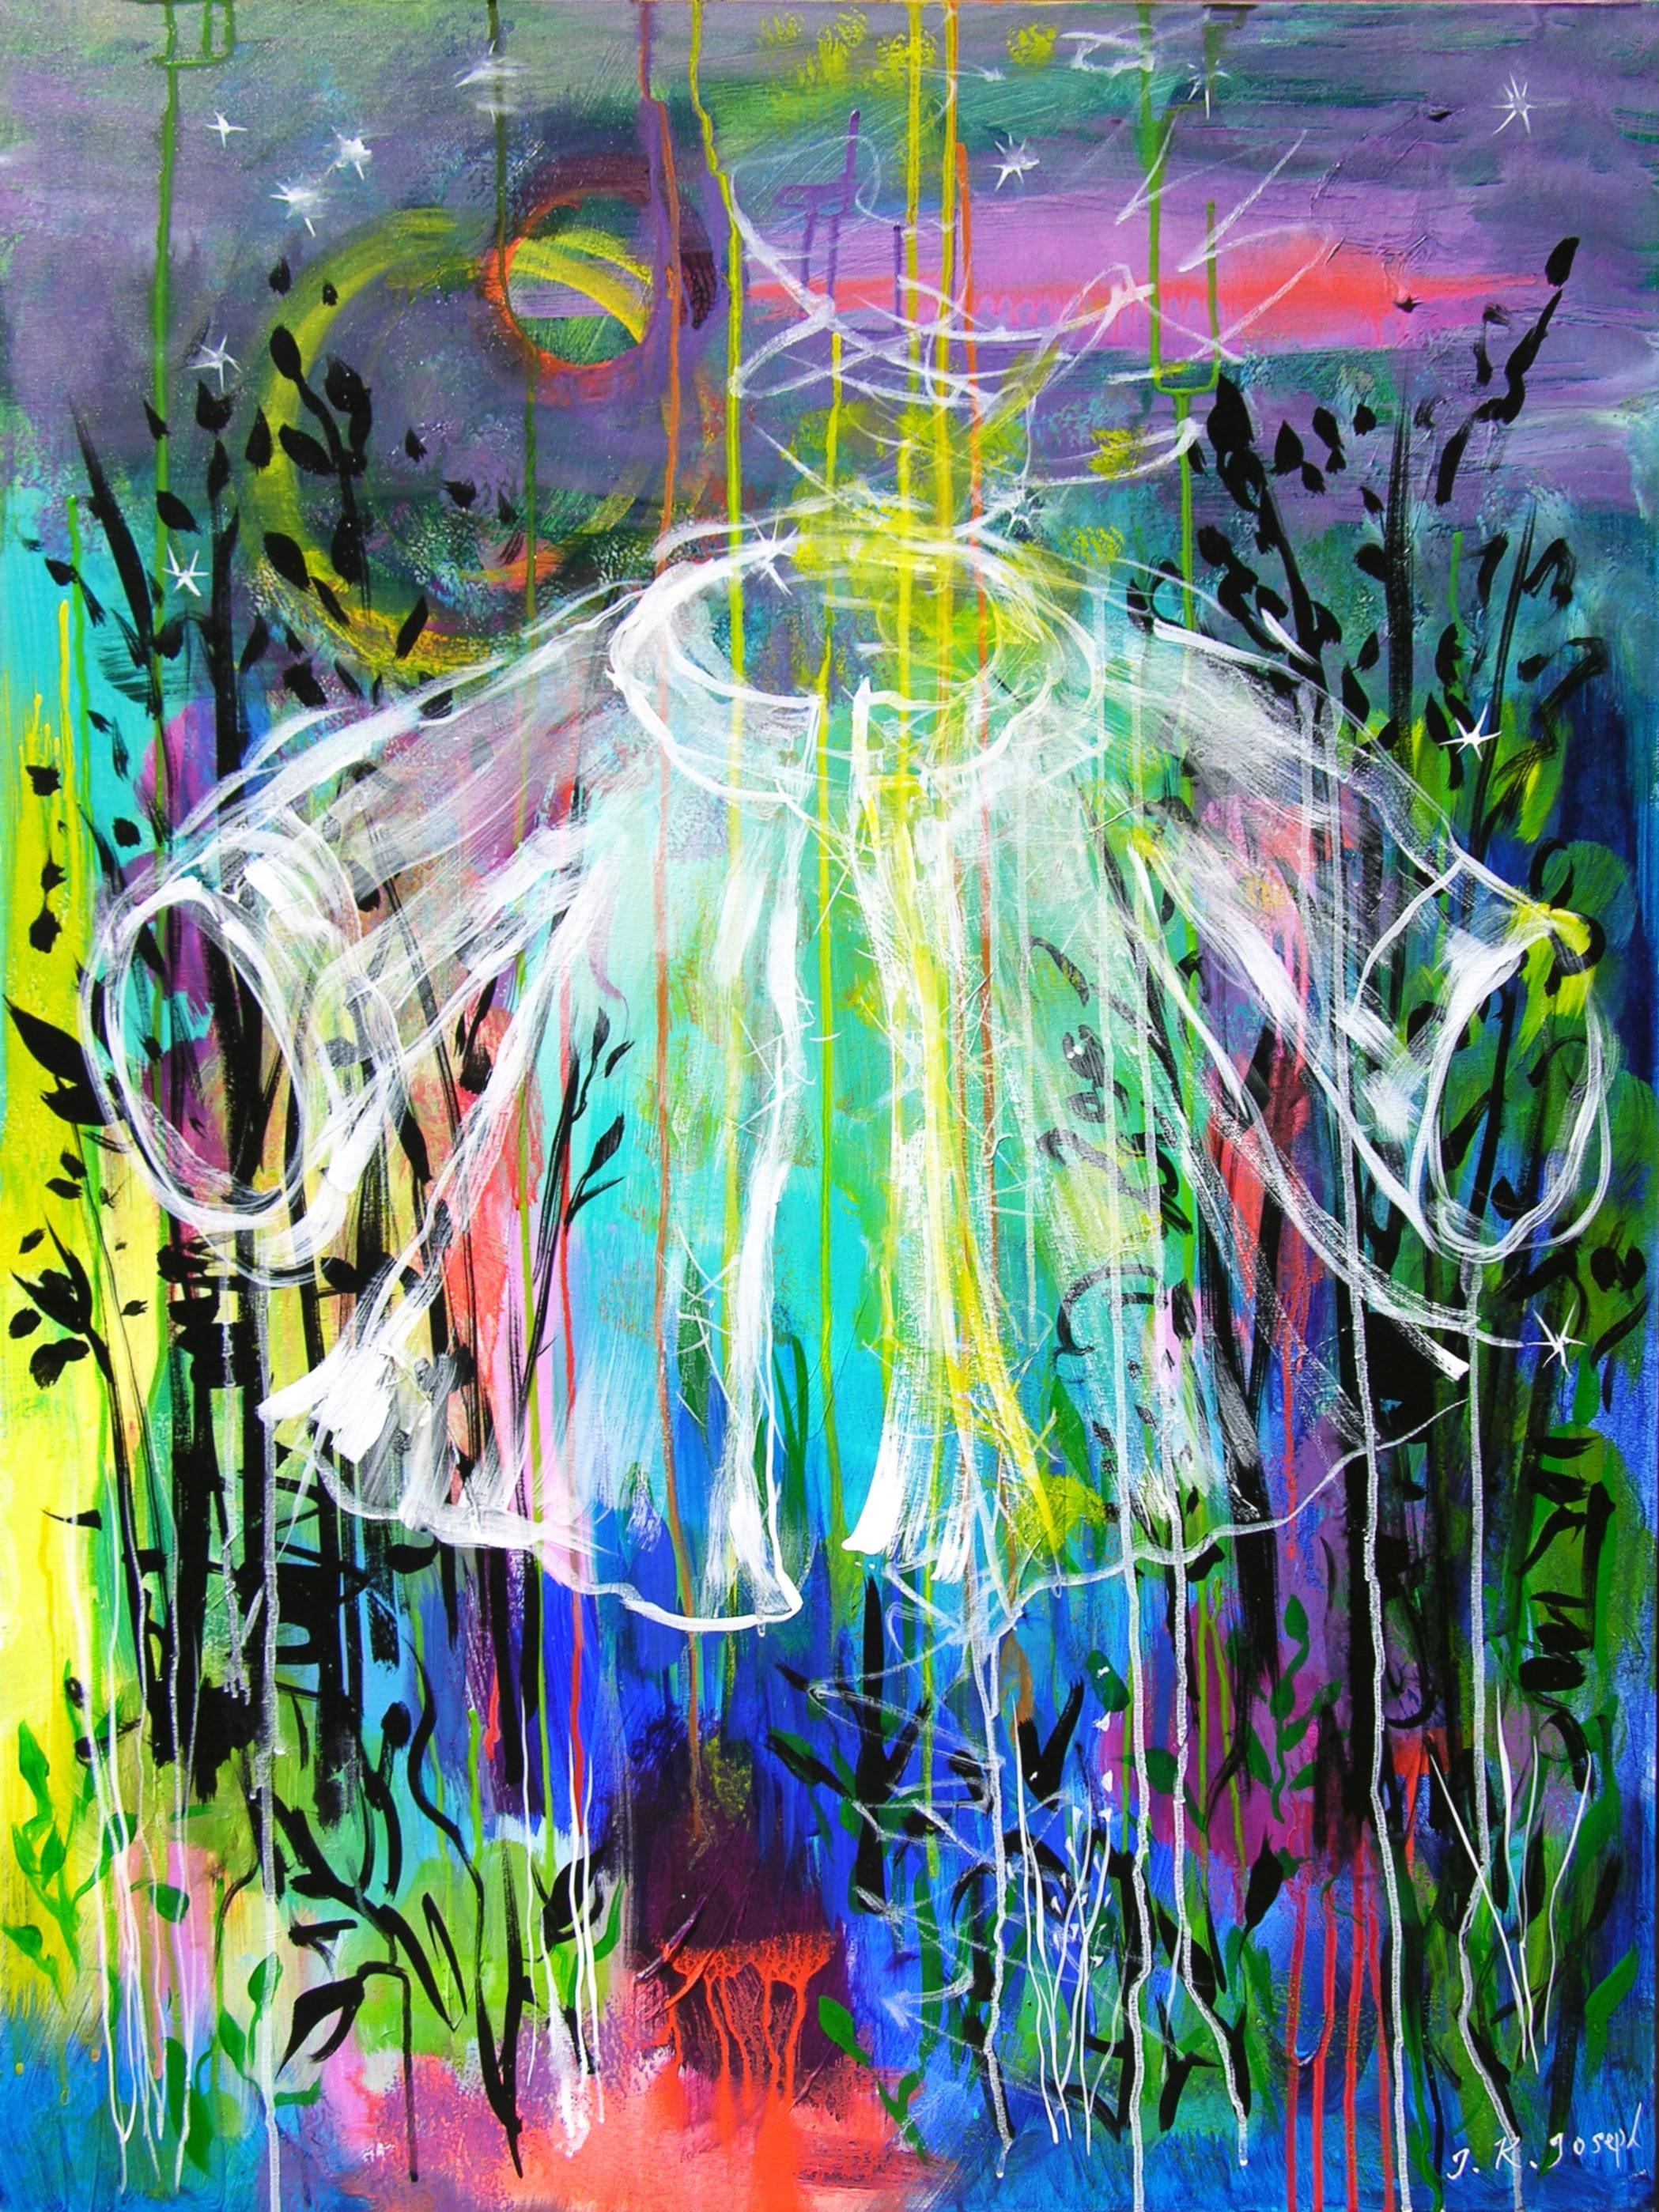 Transcendance of Loss (Tagasode Byobu)